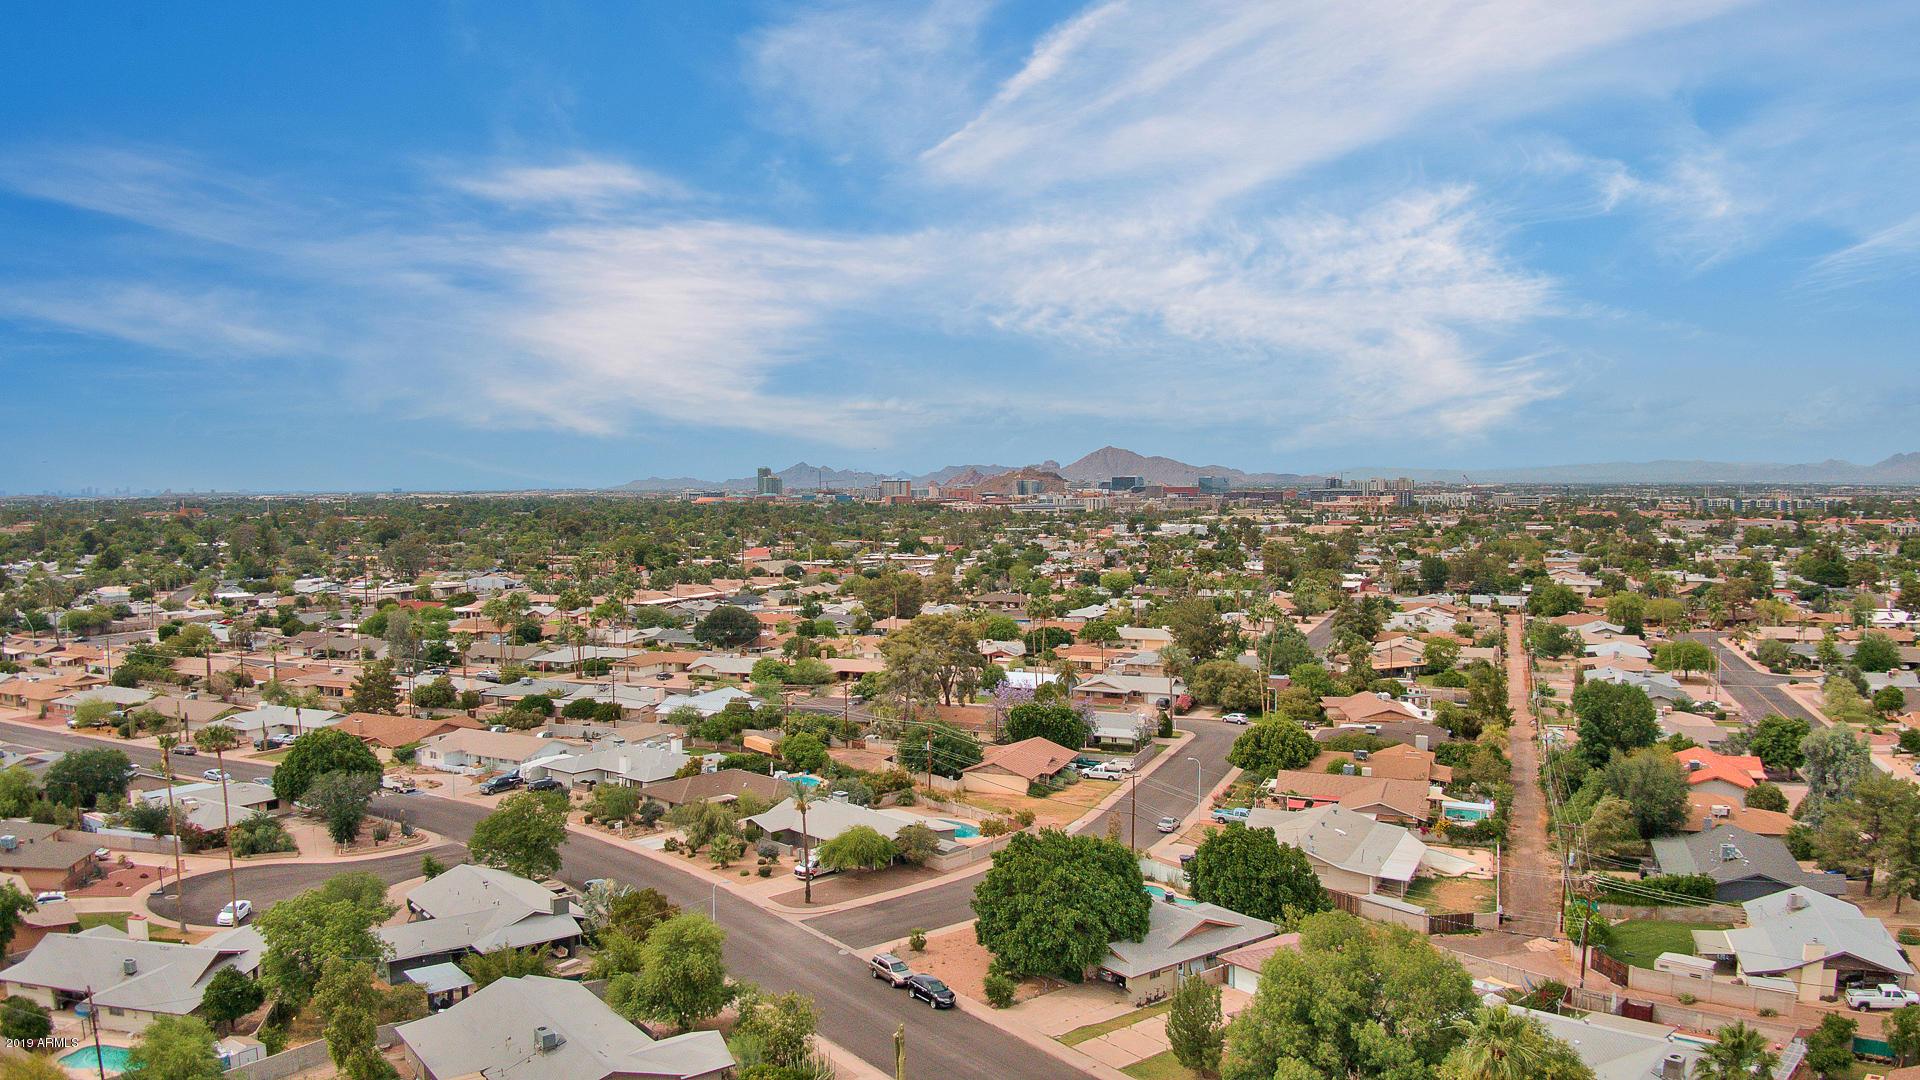 MLS 5923454 1062 E FAIRMONT Drive, Tempe, AZ 85282 Tempe AZ Tempe Royal Palms